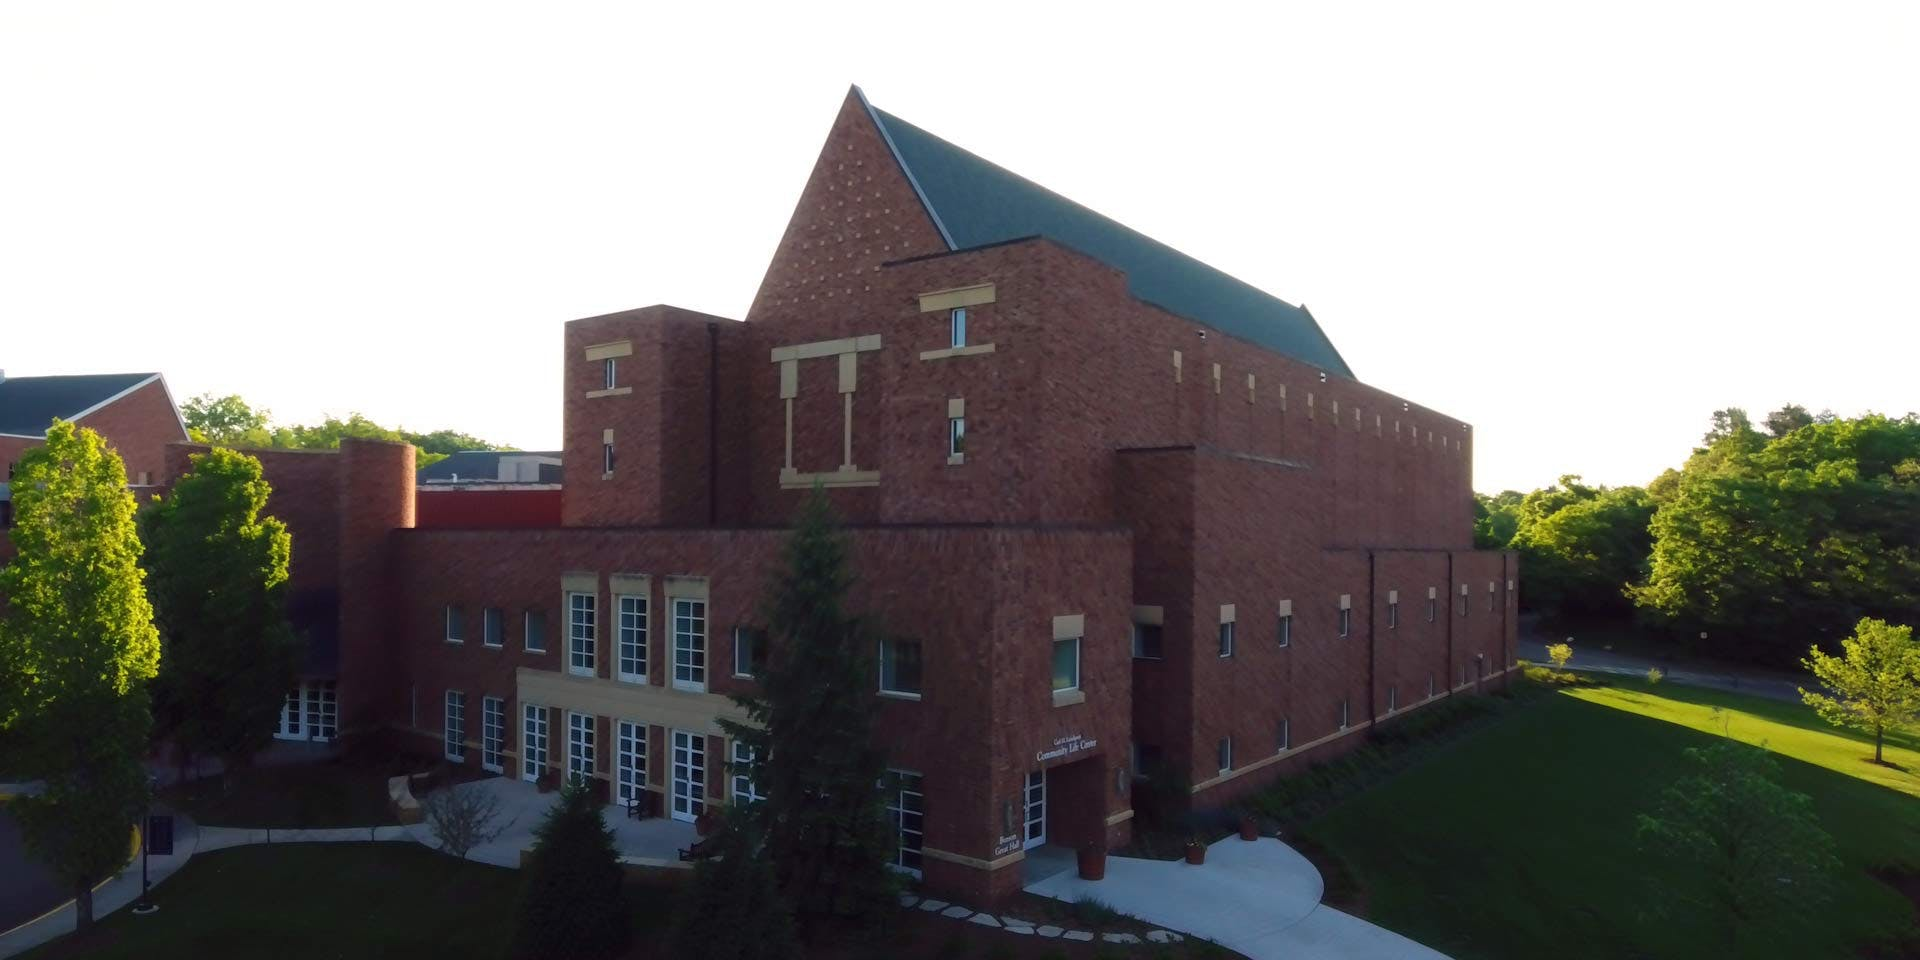 Benson Great Hall